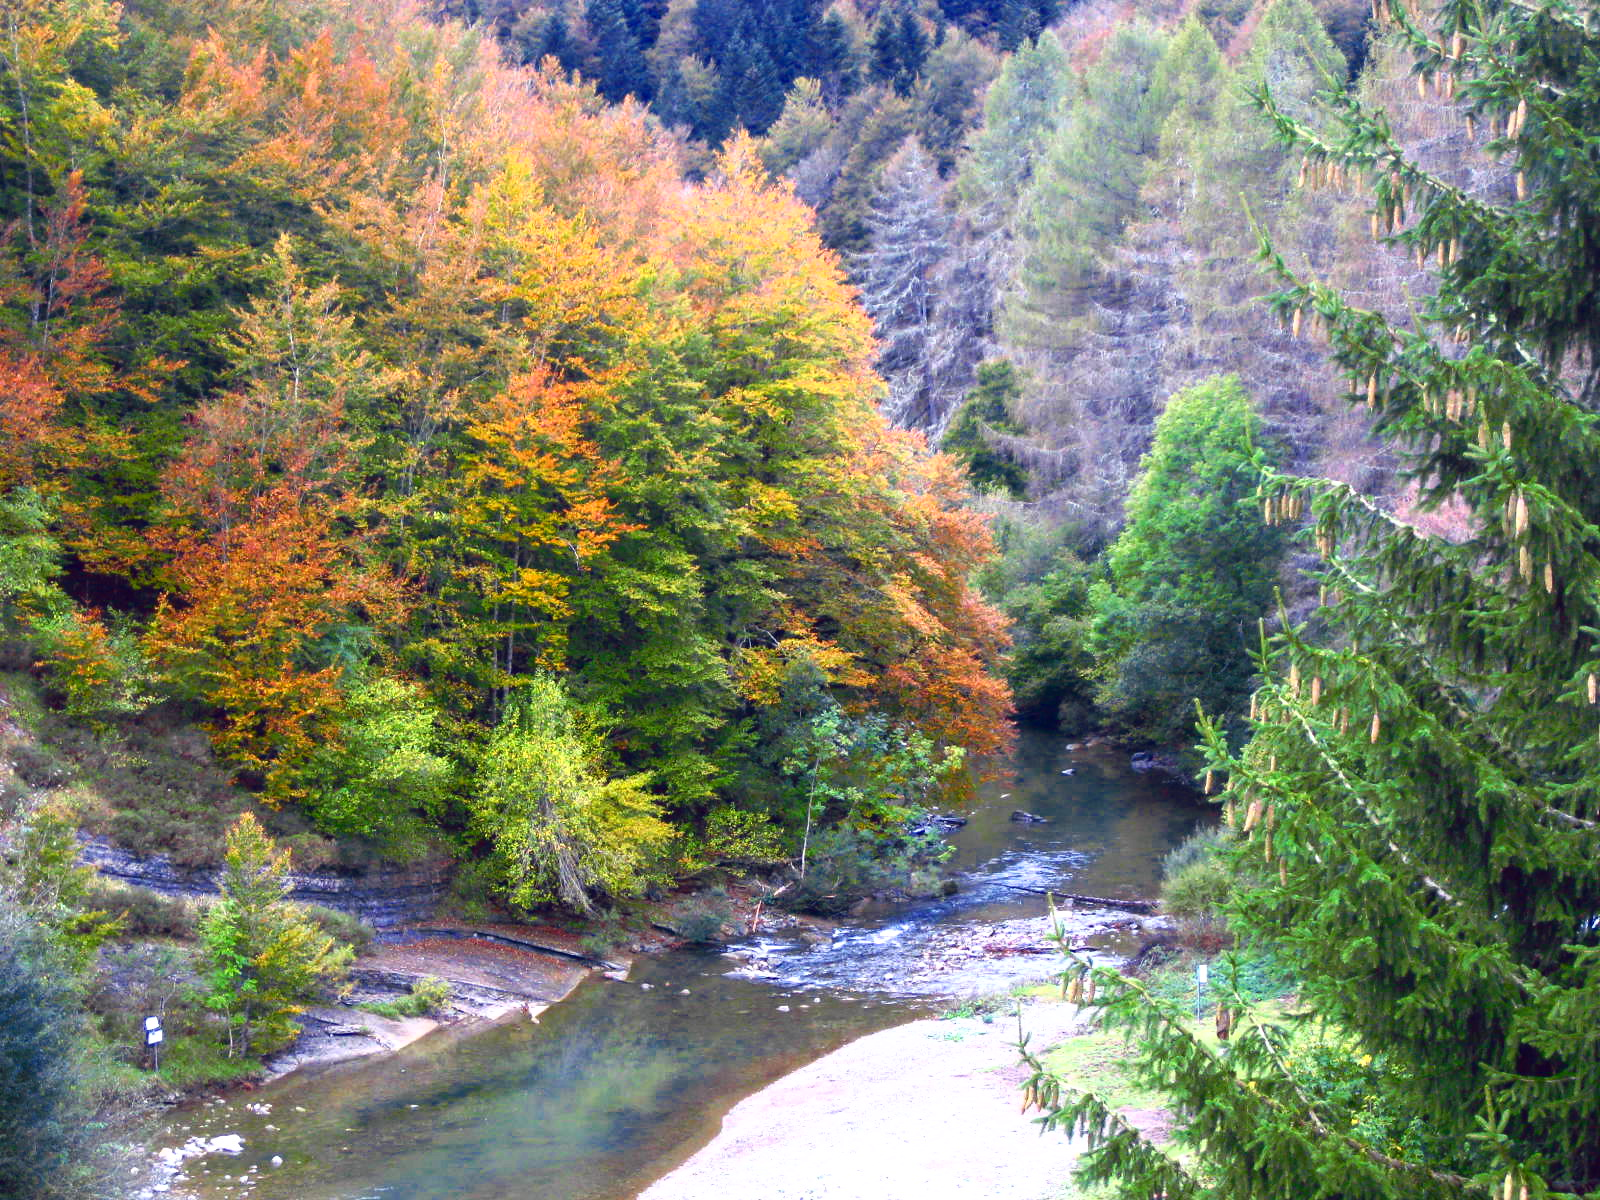 Selva-Irati-otoño-Navarra-excursiones-guiadas